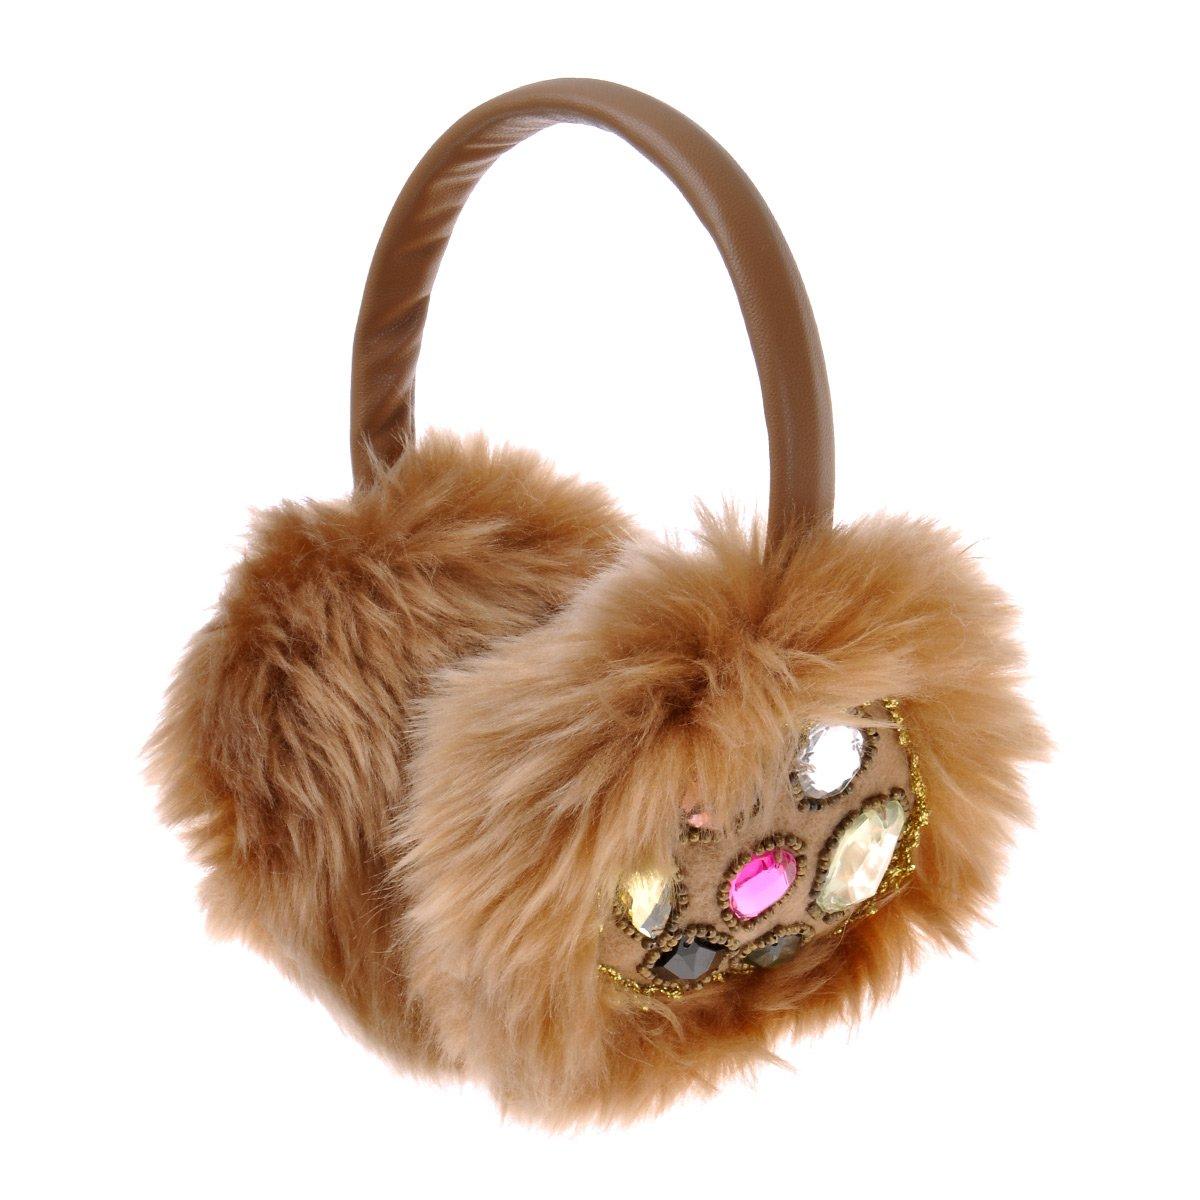 ZLYC Women Hand Sewing Fashion Rhinestone Embroidery Band Fur Earmuffs Earwarmer, Brown